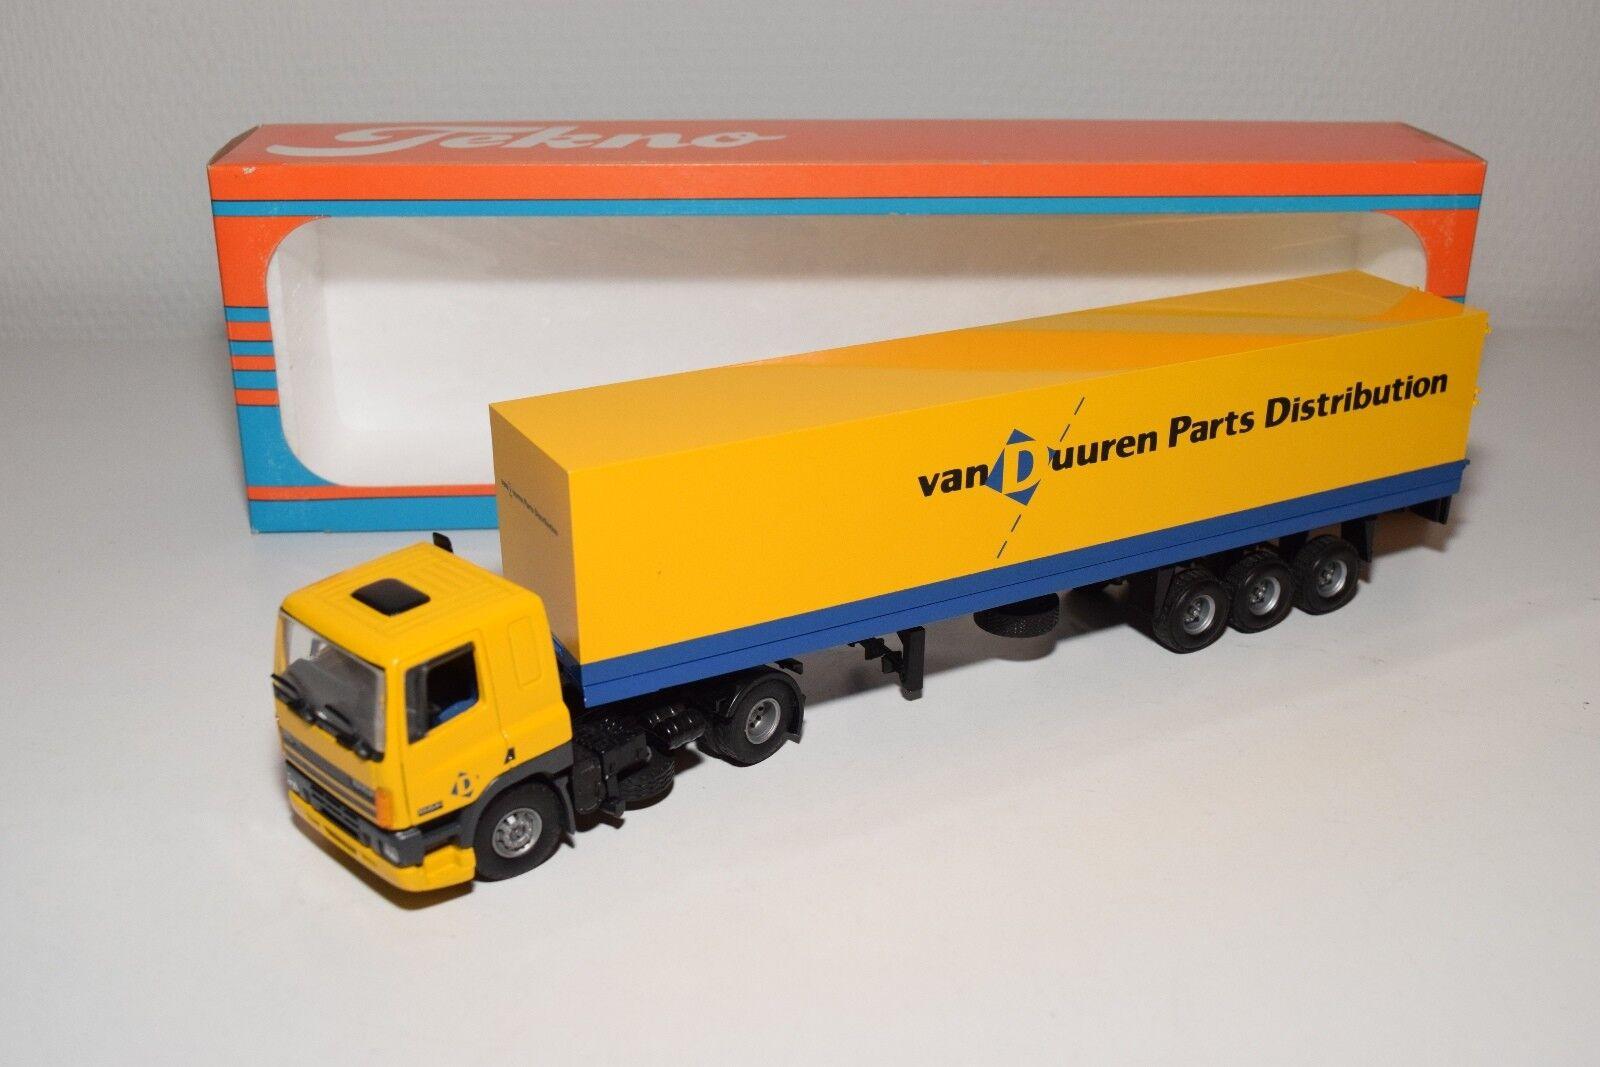 S TEKNO DAF 85 VAN DUUREN PARTS DISTRIBUTION TRUCK WITH TRAILER MINT BOXED